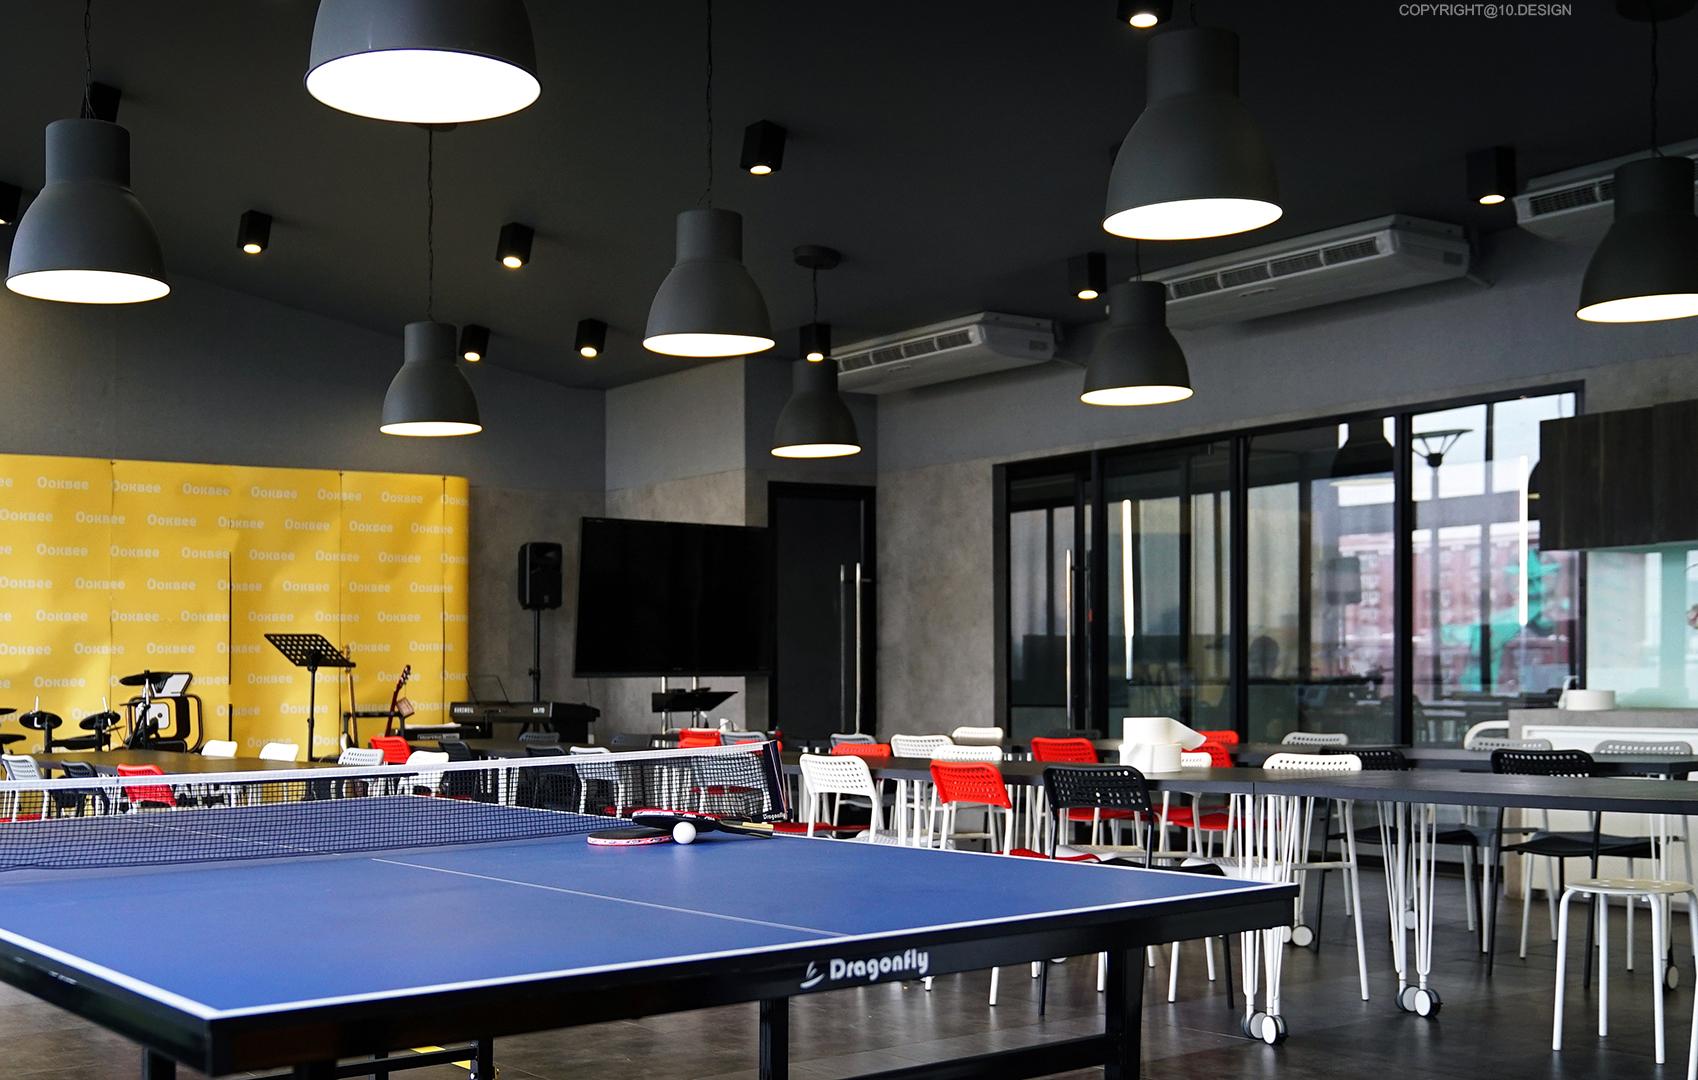 10DESIGN ookbee head office interior design start up 10